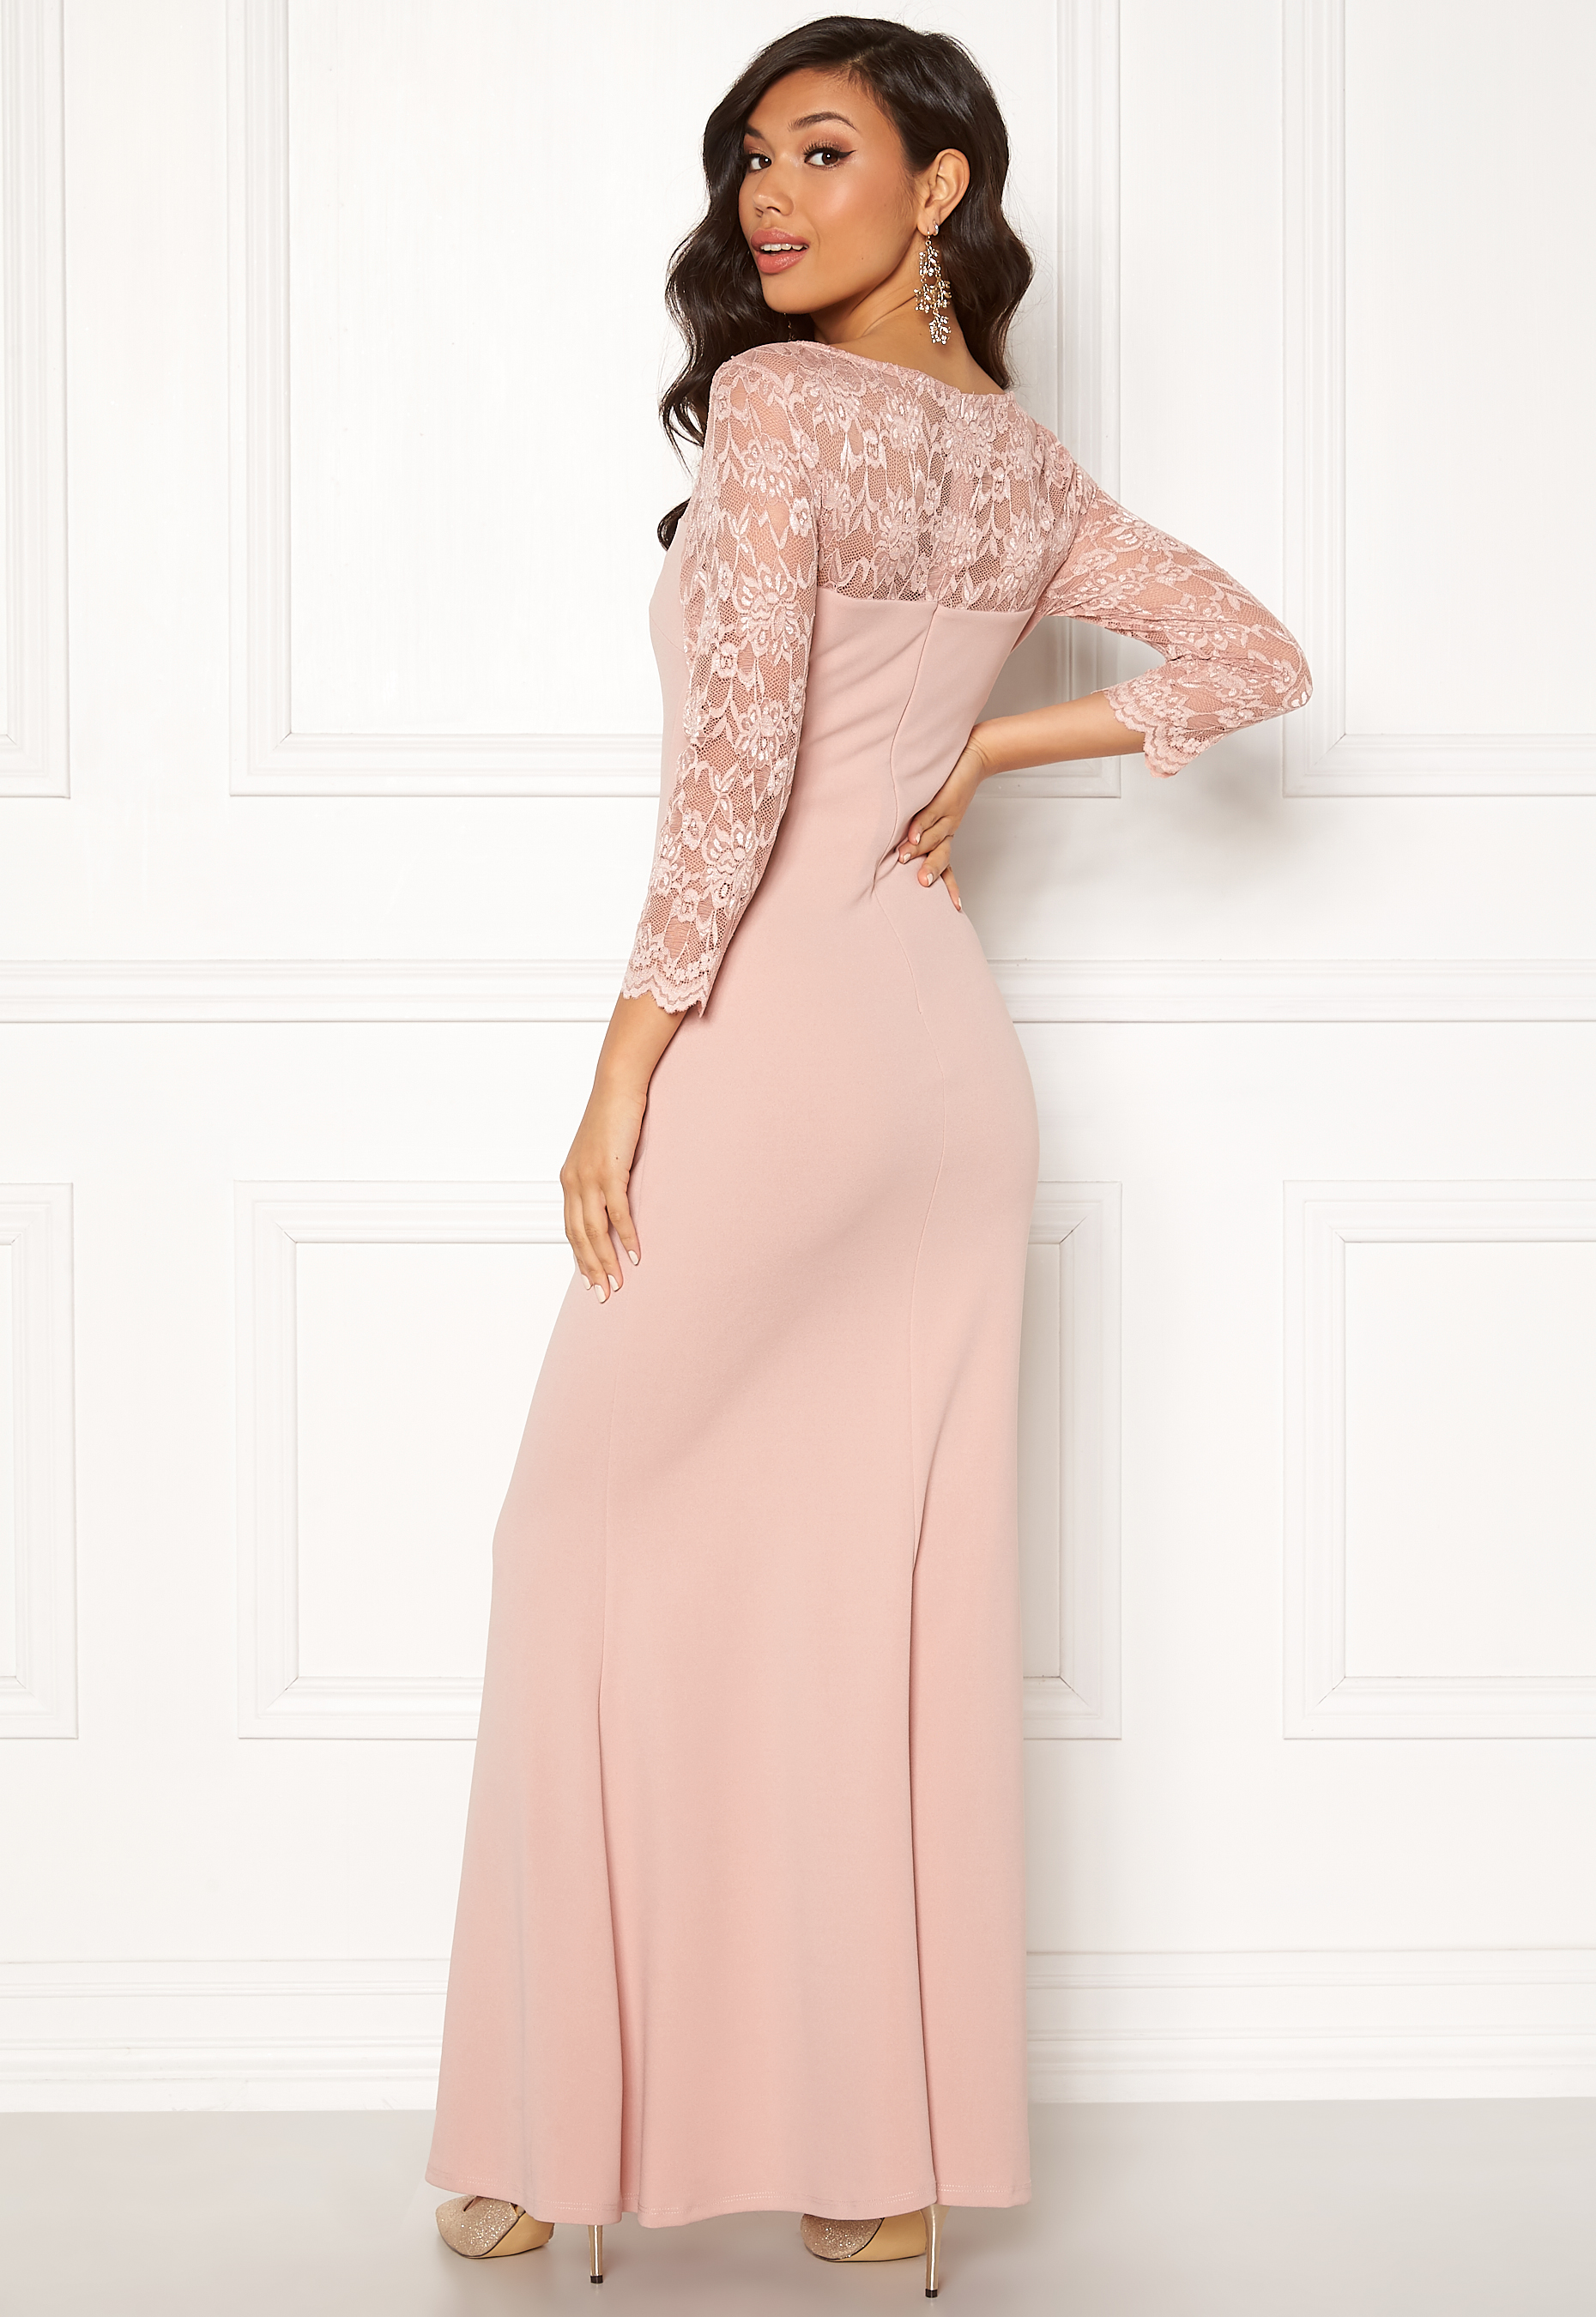 0f2c4c4b Goddiva 3/4 Lace Trim Maxi Dress Blush - Bubbleroom